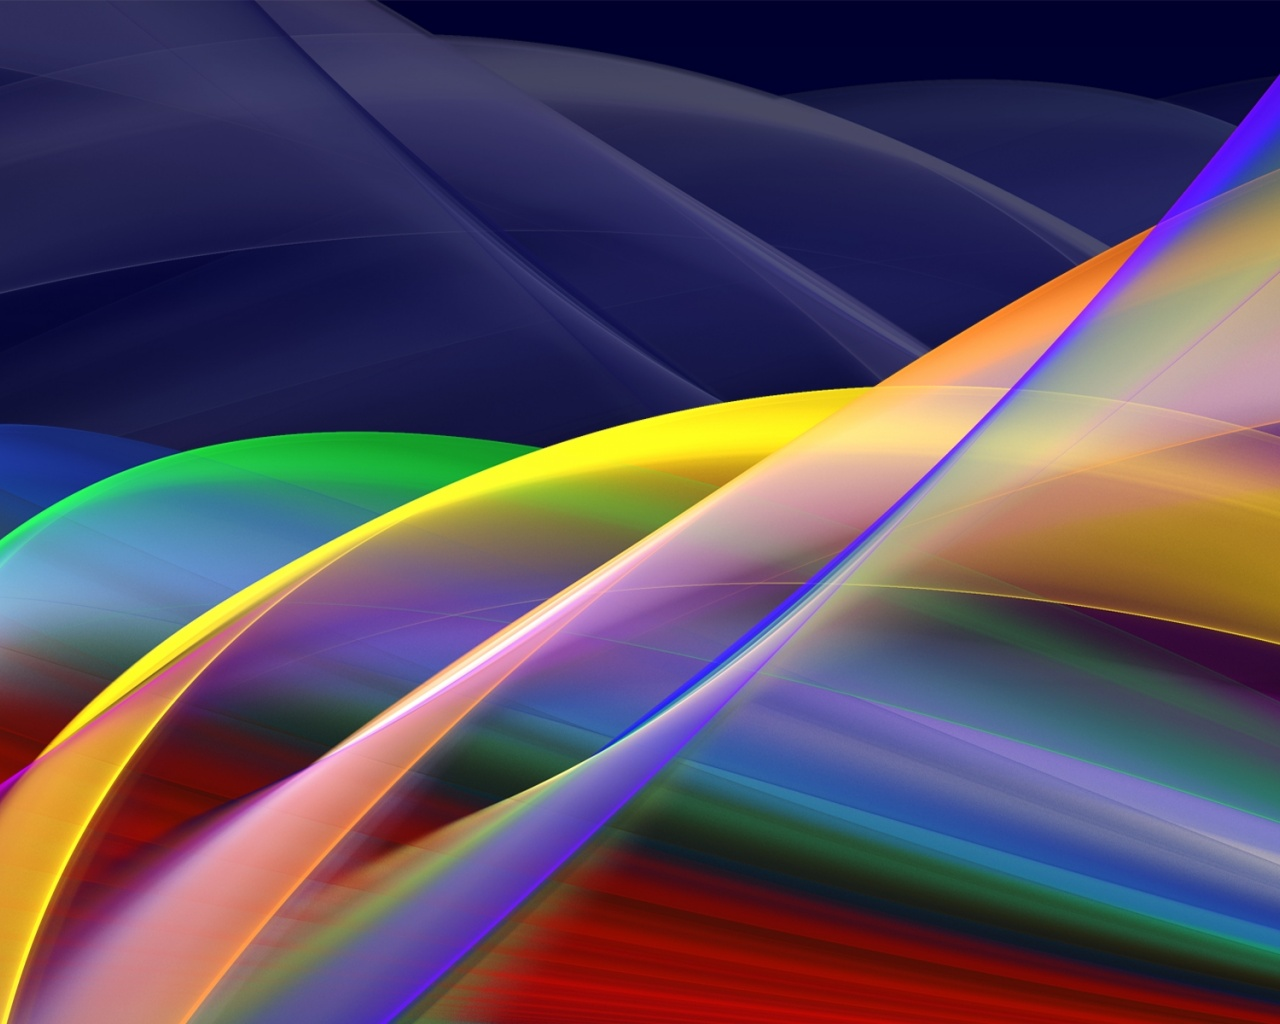 1280x1024 Windows 8 Colorful desktop PC and Mac wallpaper 1280x1024